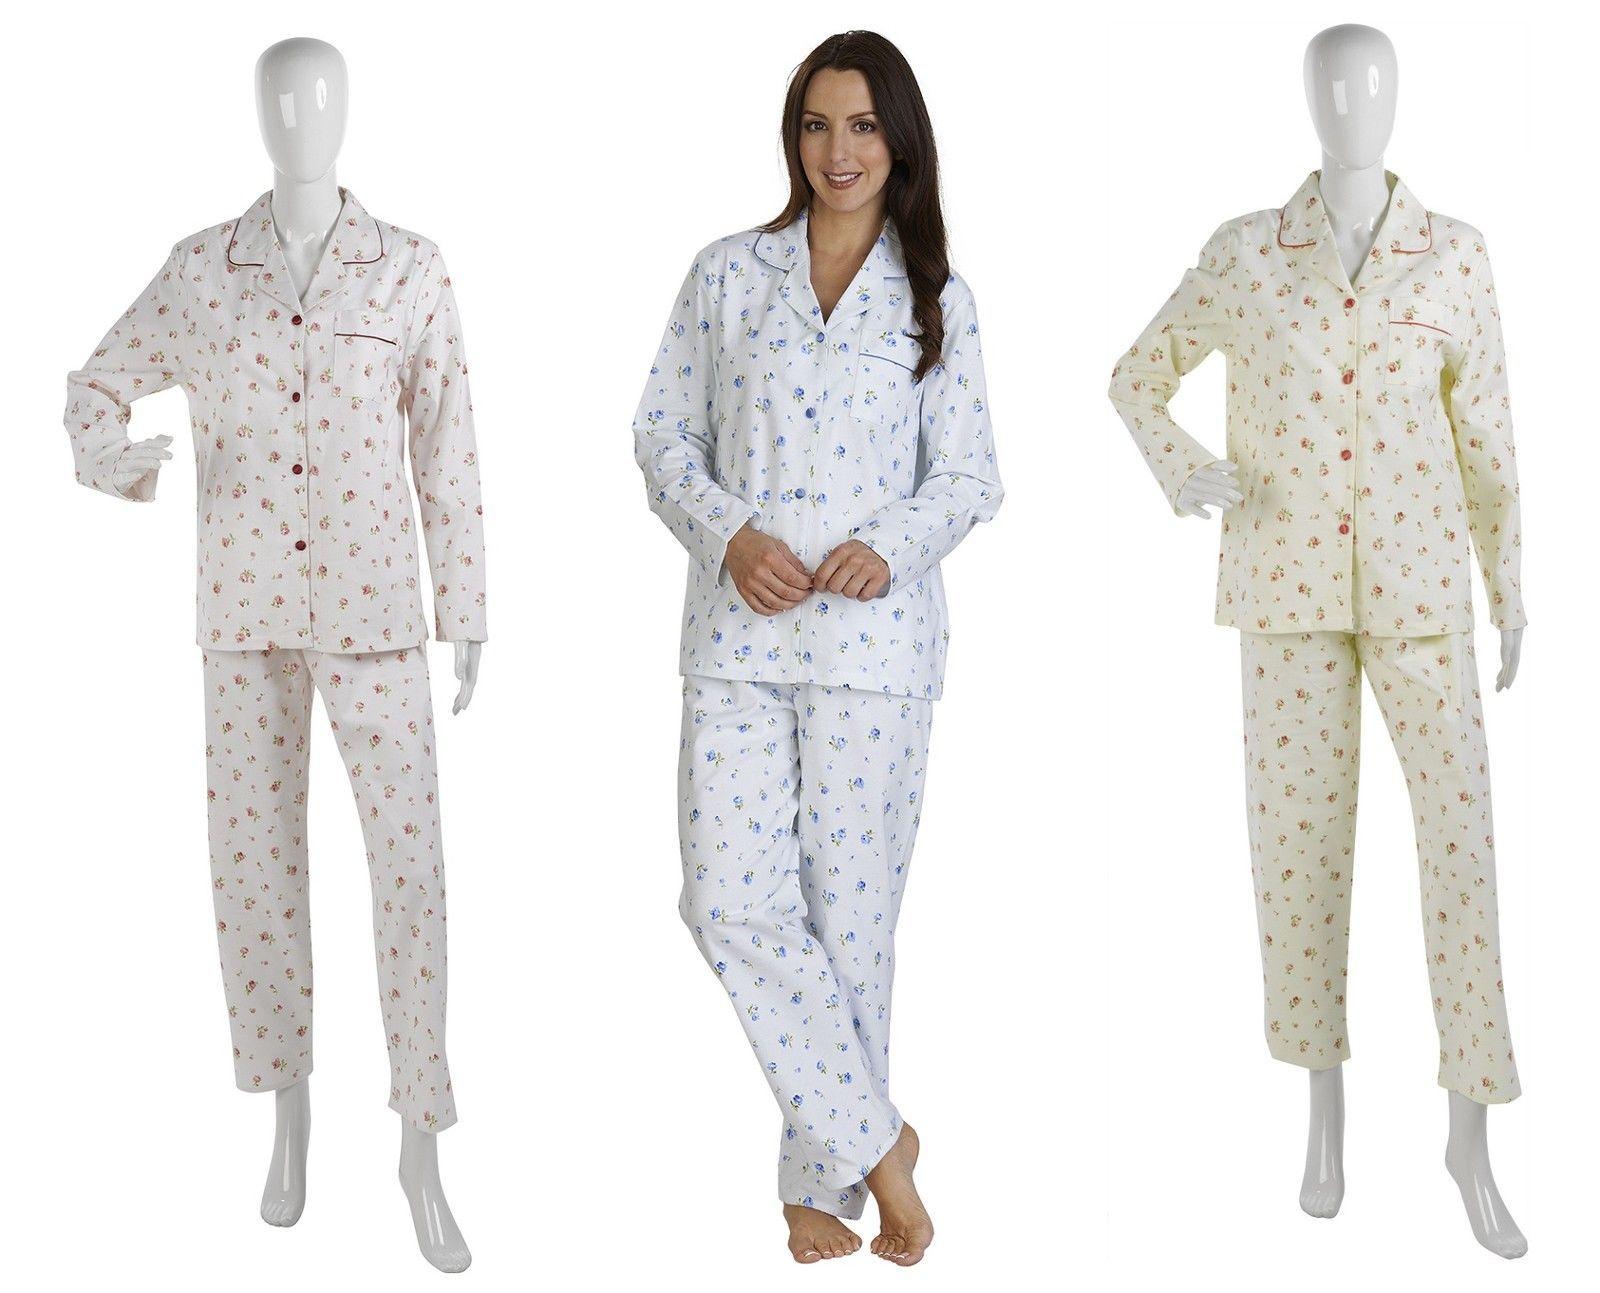 c5f501df9a Womens Slenderella Flower Design Pjs 100% Brushed Cotton Long Sleeved  Pyjamas